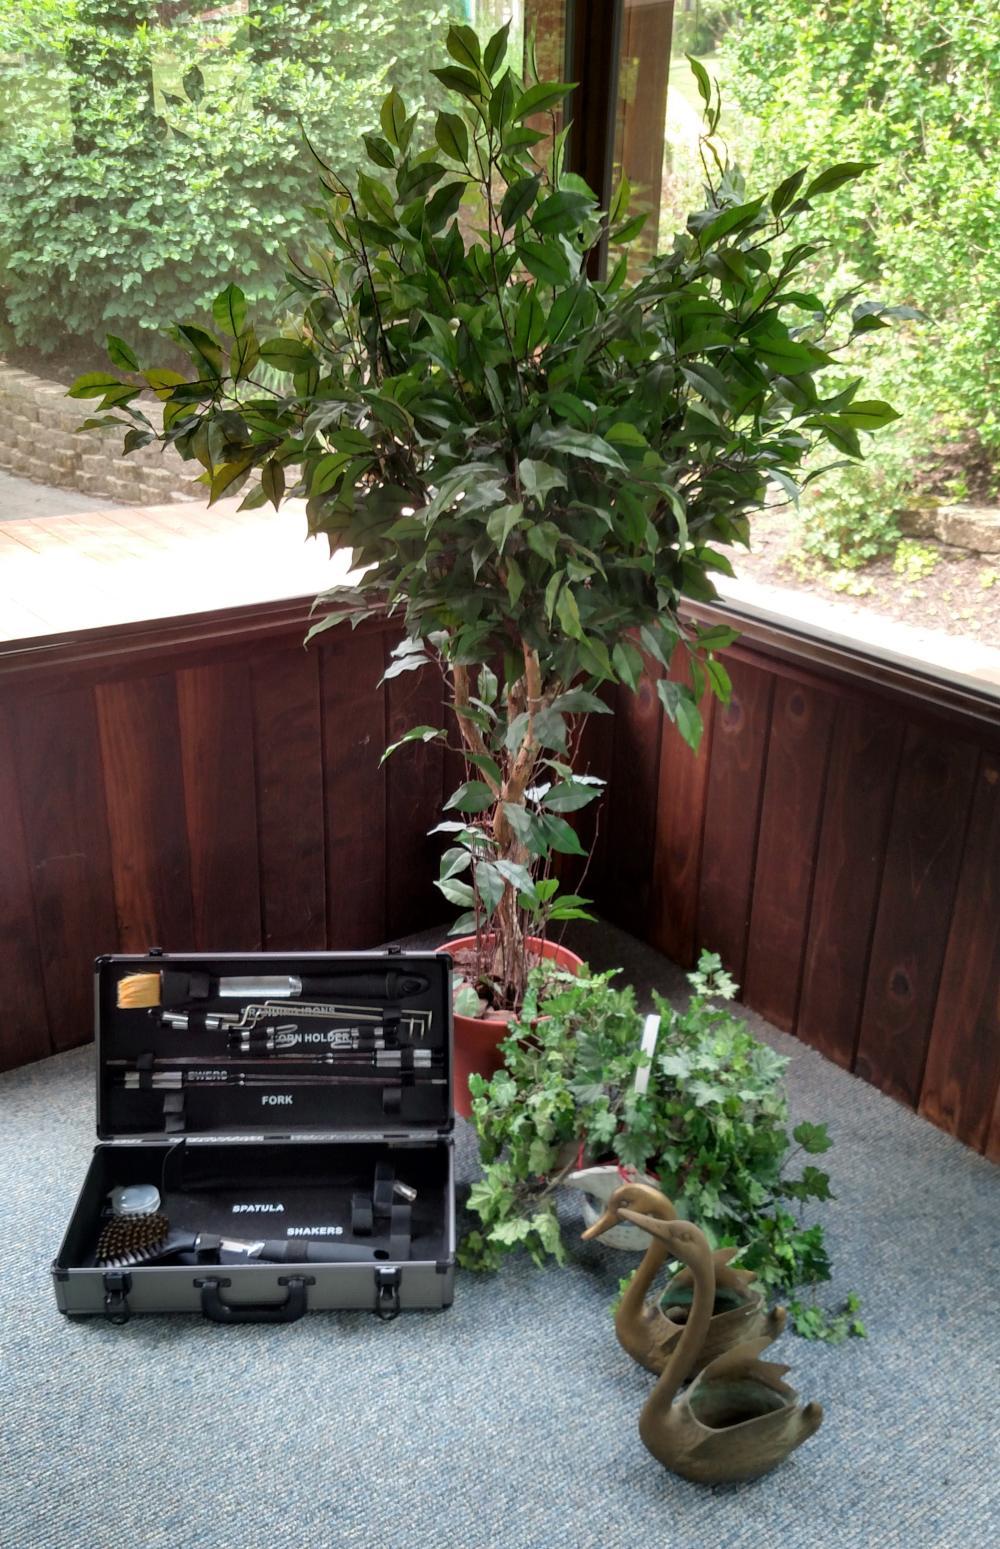 2 brass ducks, artificial plants, partial grill set